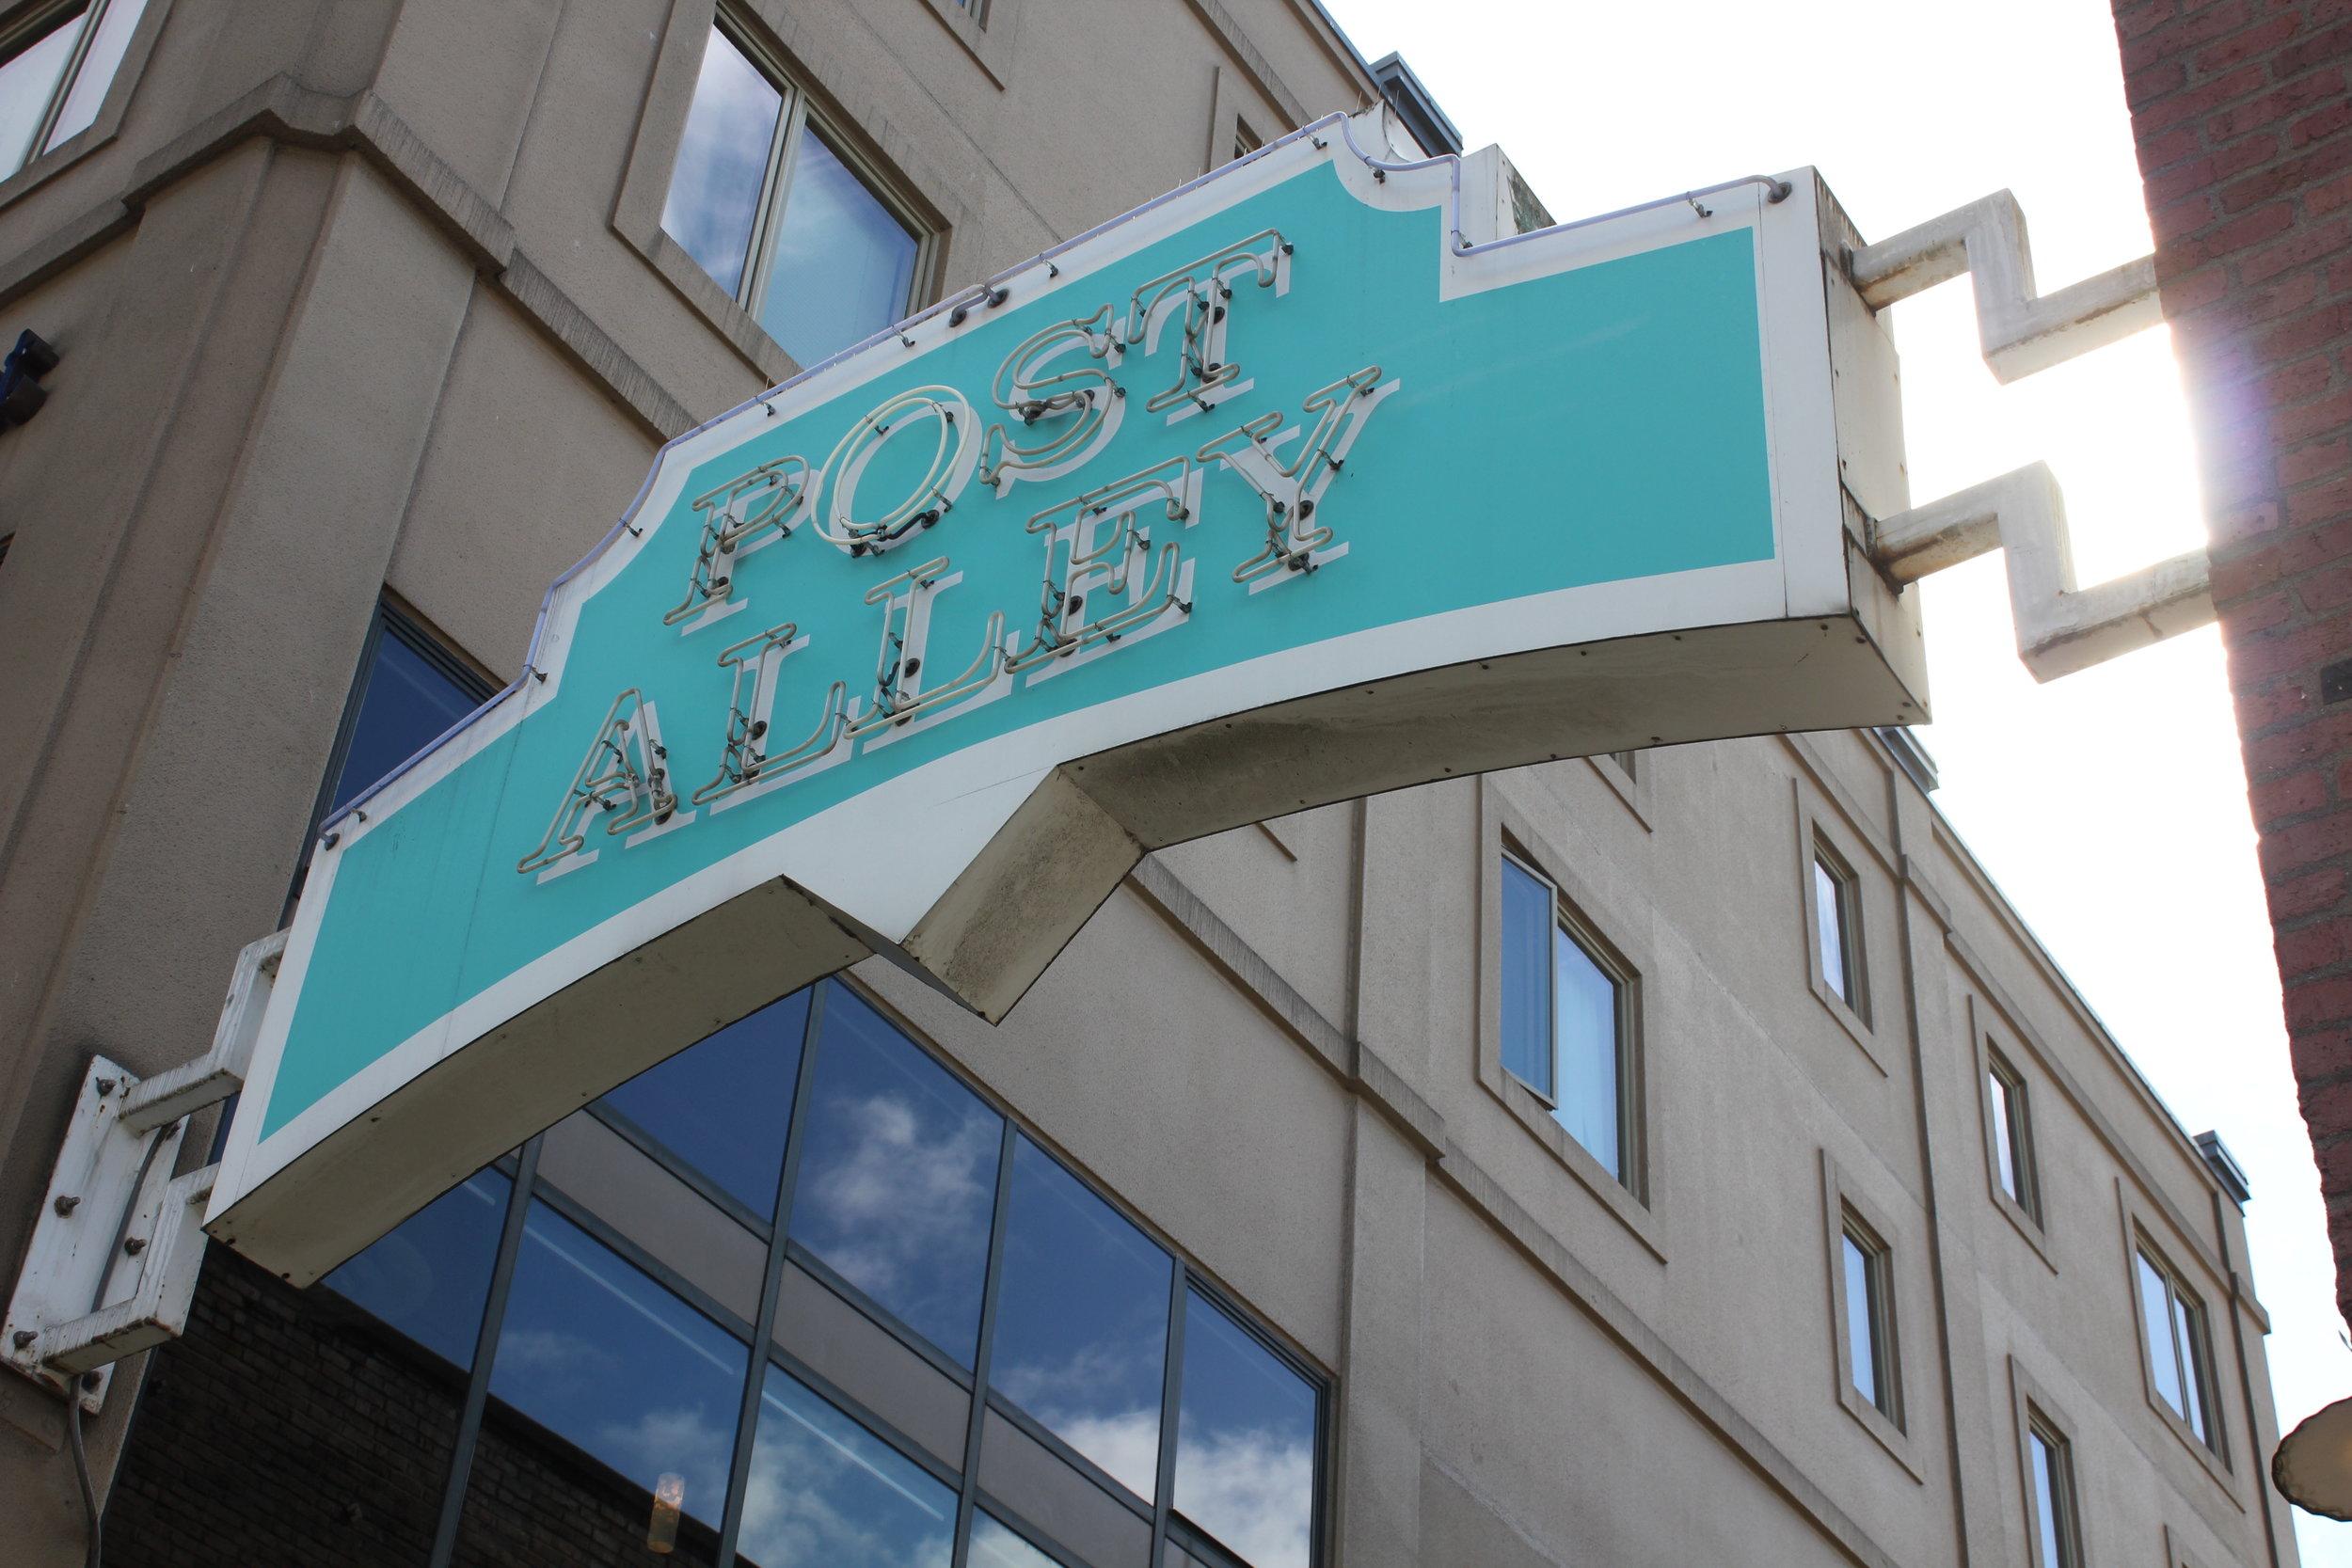 Post Alley – Entrance sign